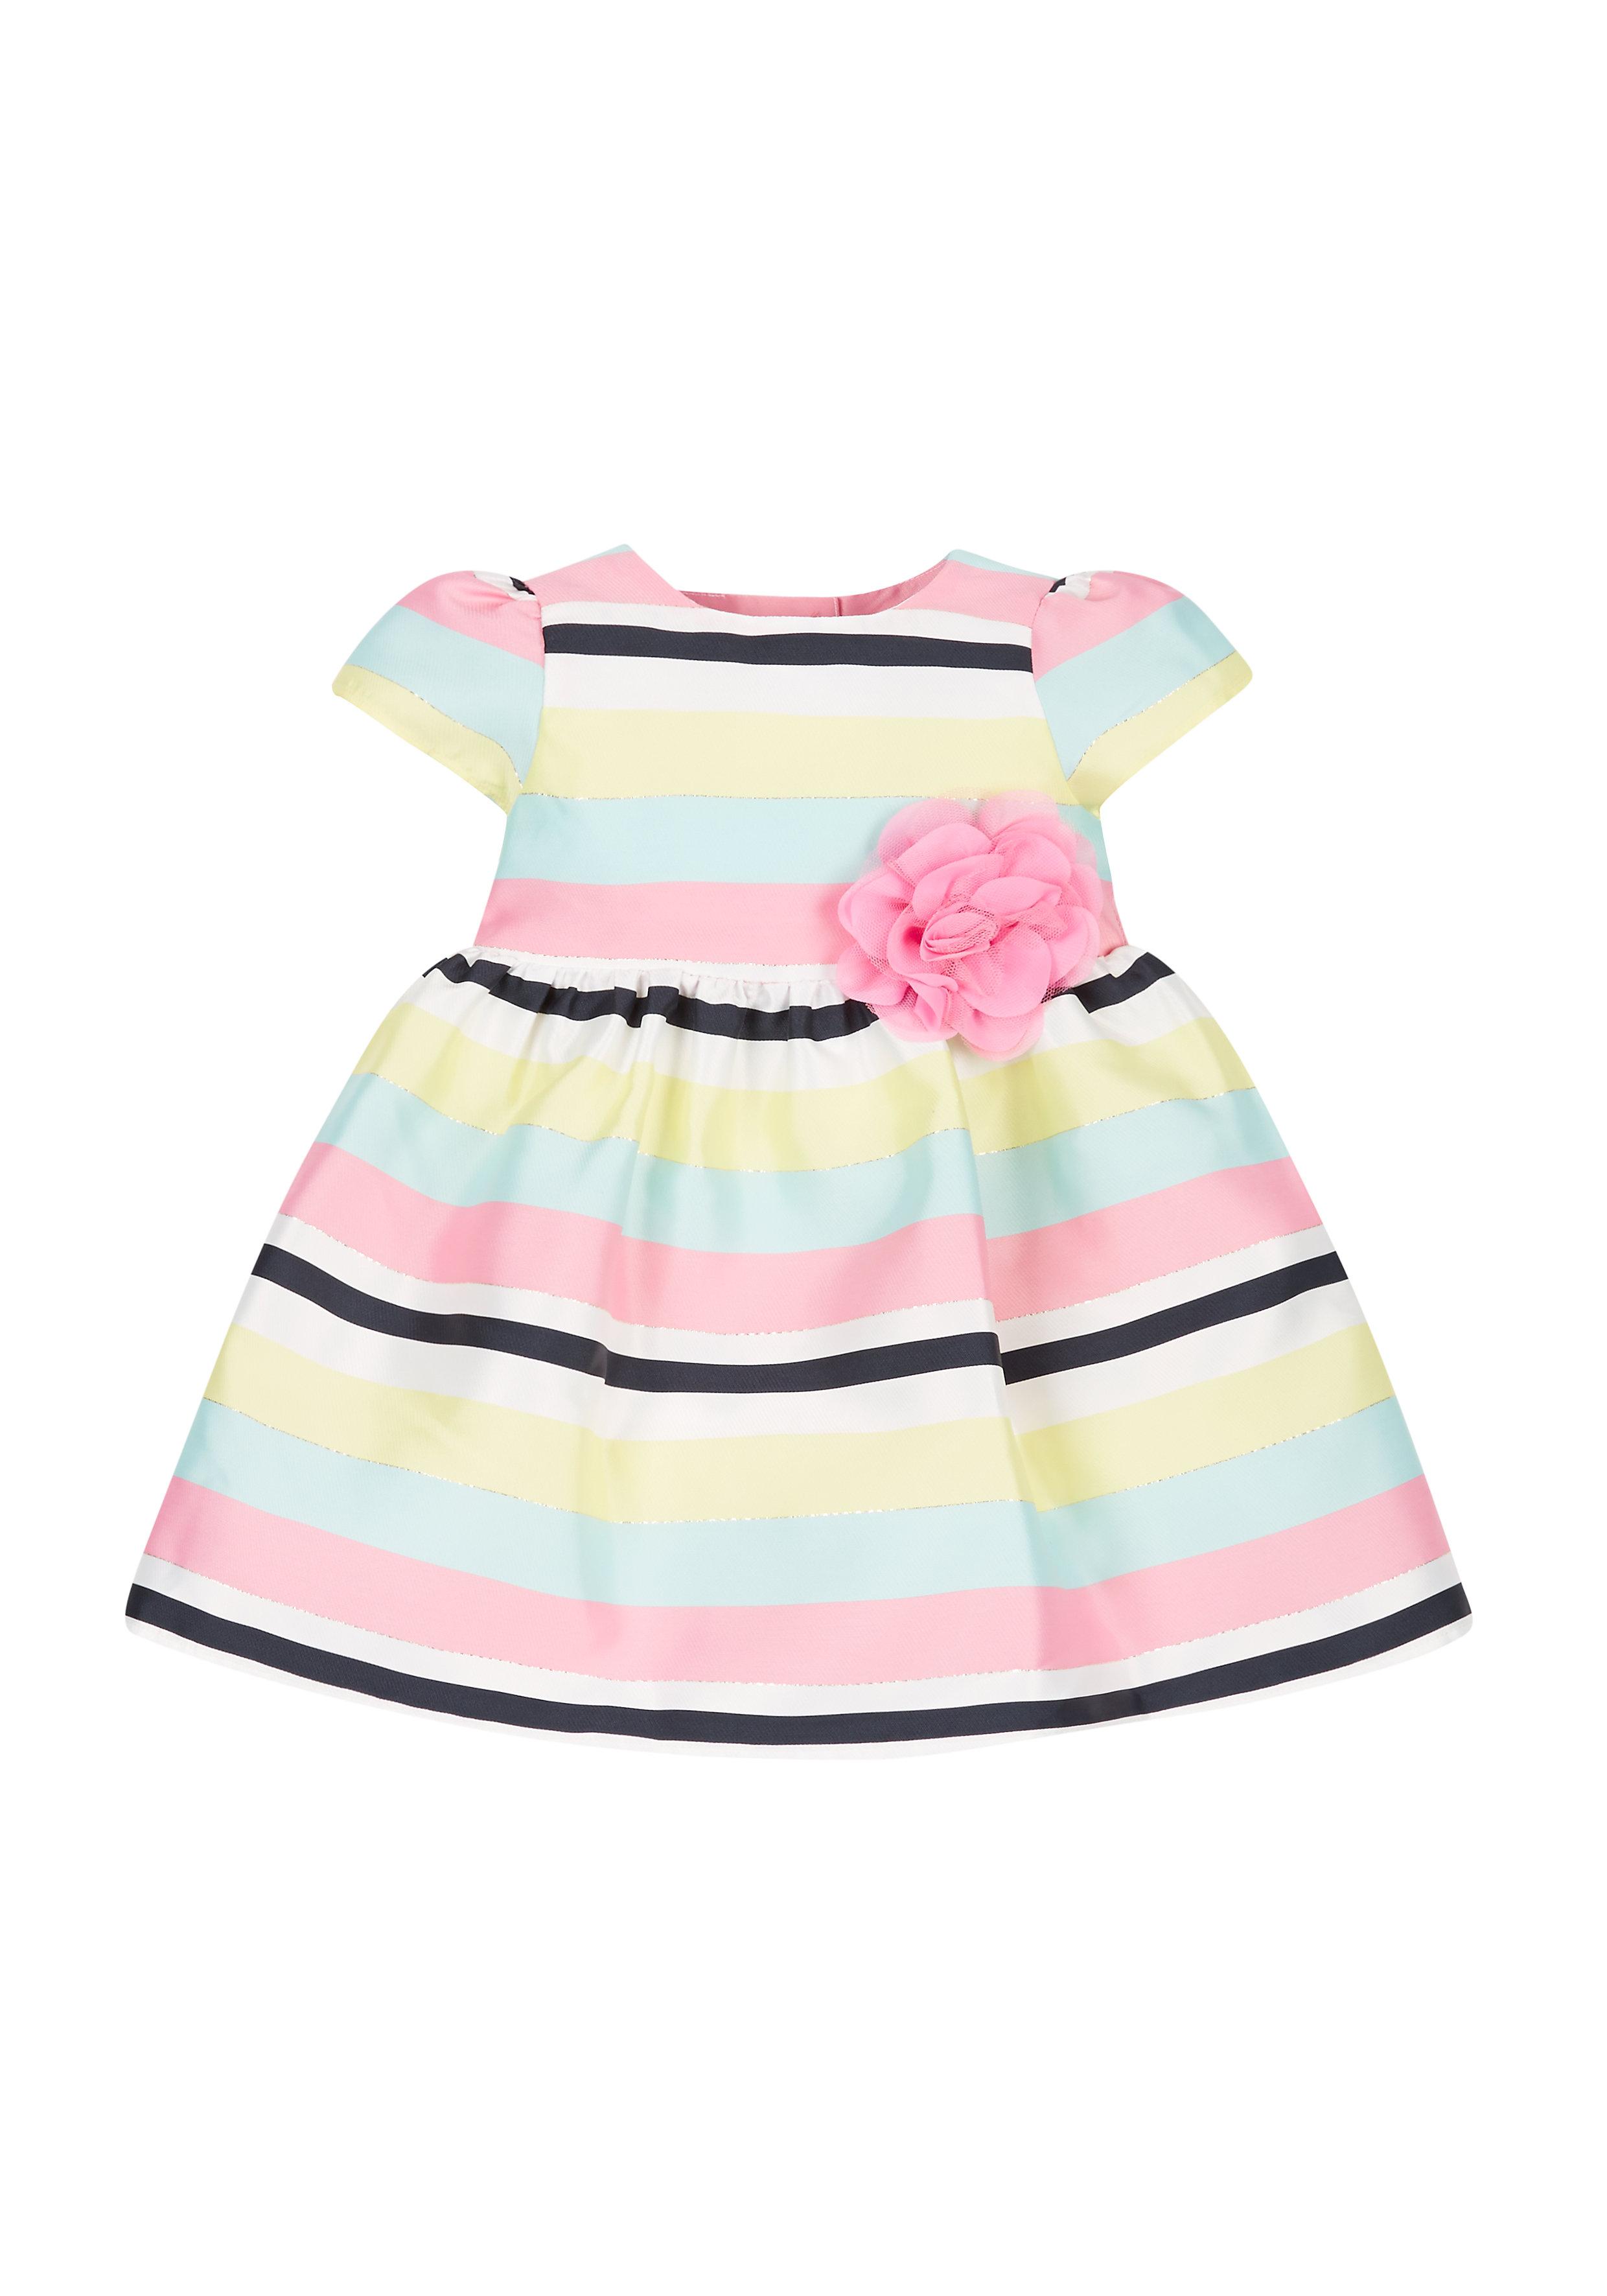 Mothercare | Girls Jacquard Stripe Prom Dress - Pink